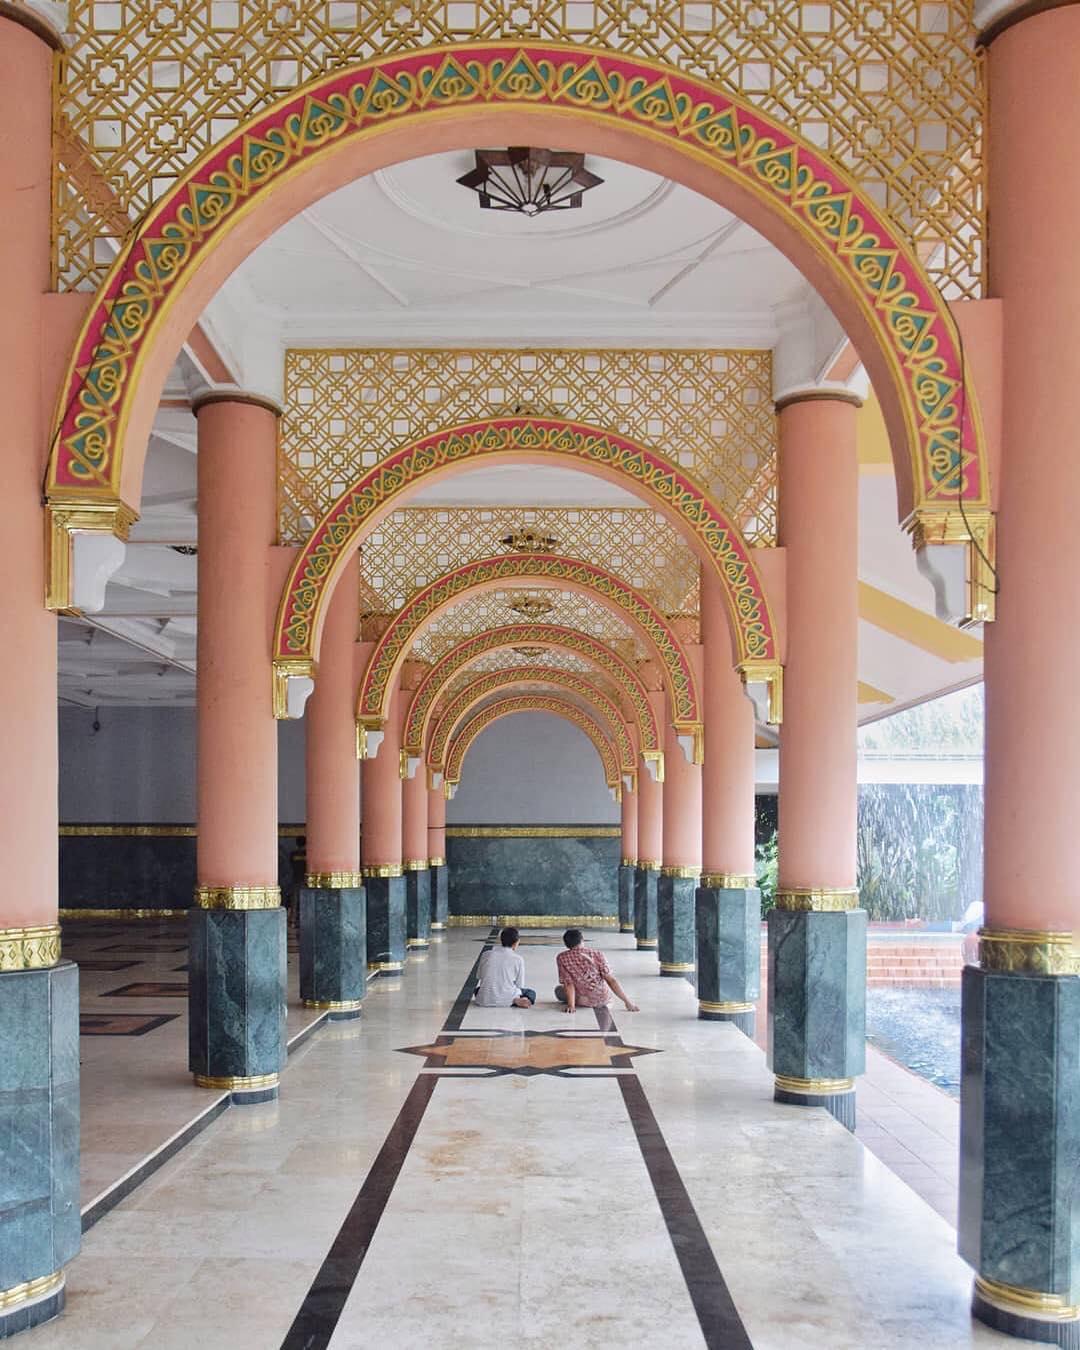 Masjid Kampus UGM, Masjid Kampus UGM Yogyakarta, Yogyakarta, Dolan Dolen, Dolaners Masjid Kampus UGM by mumtazmahfud - Dolan Dolen